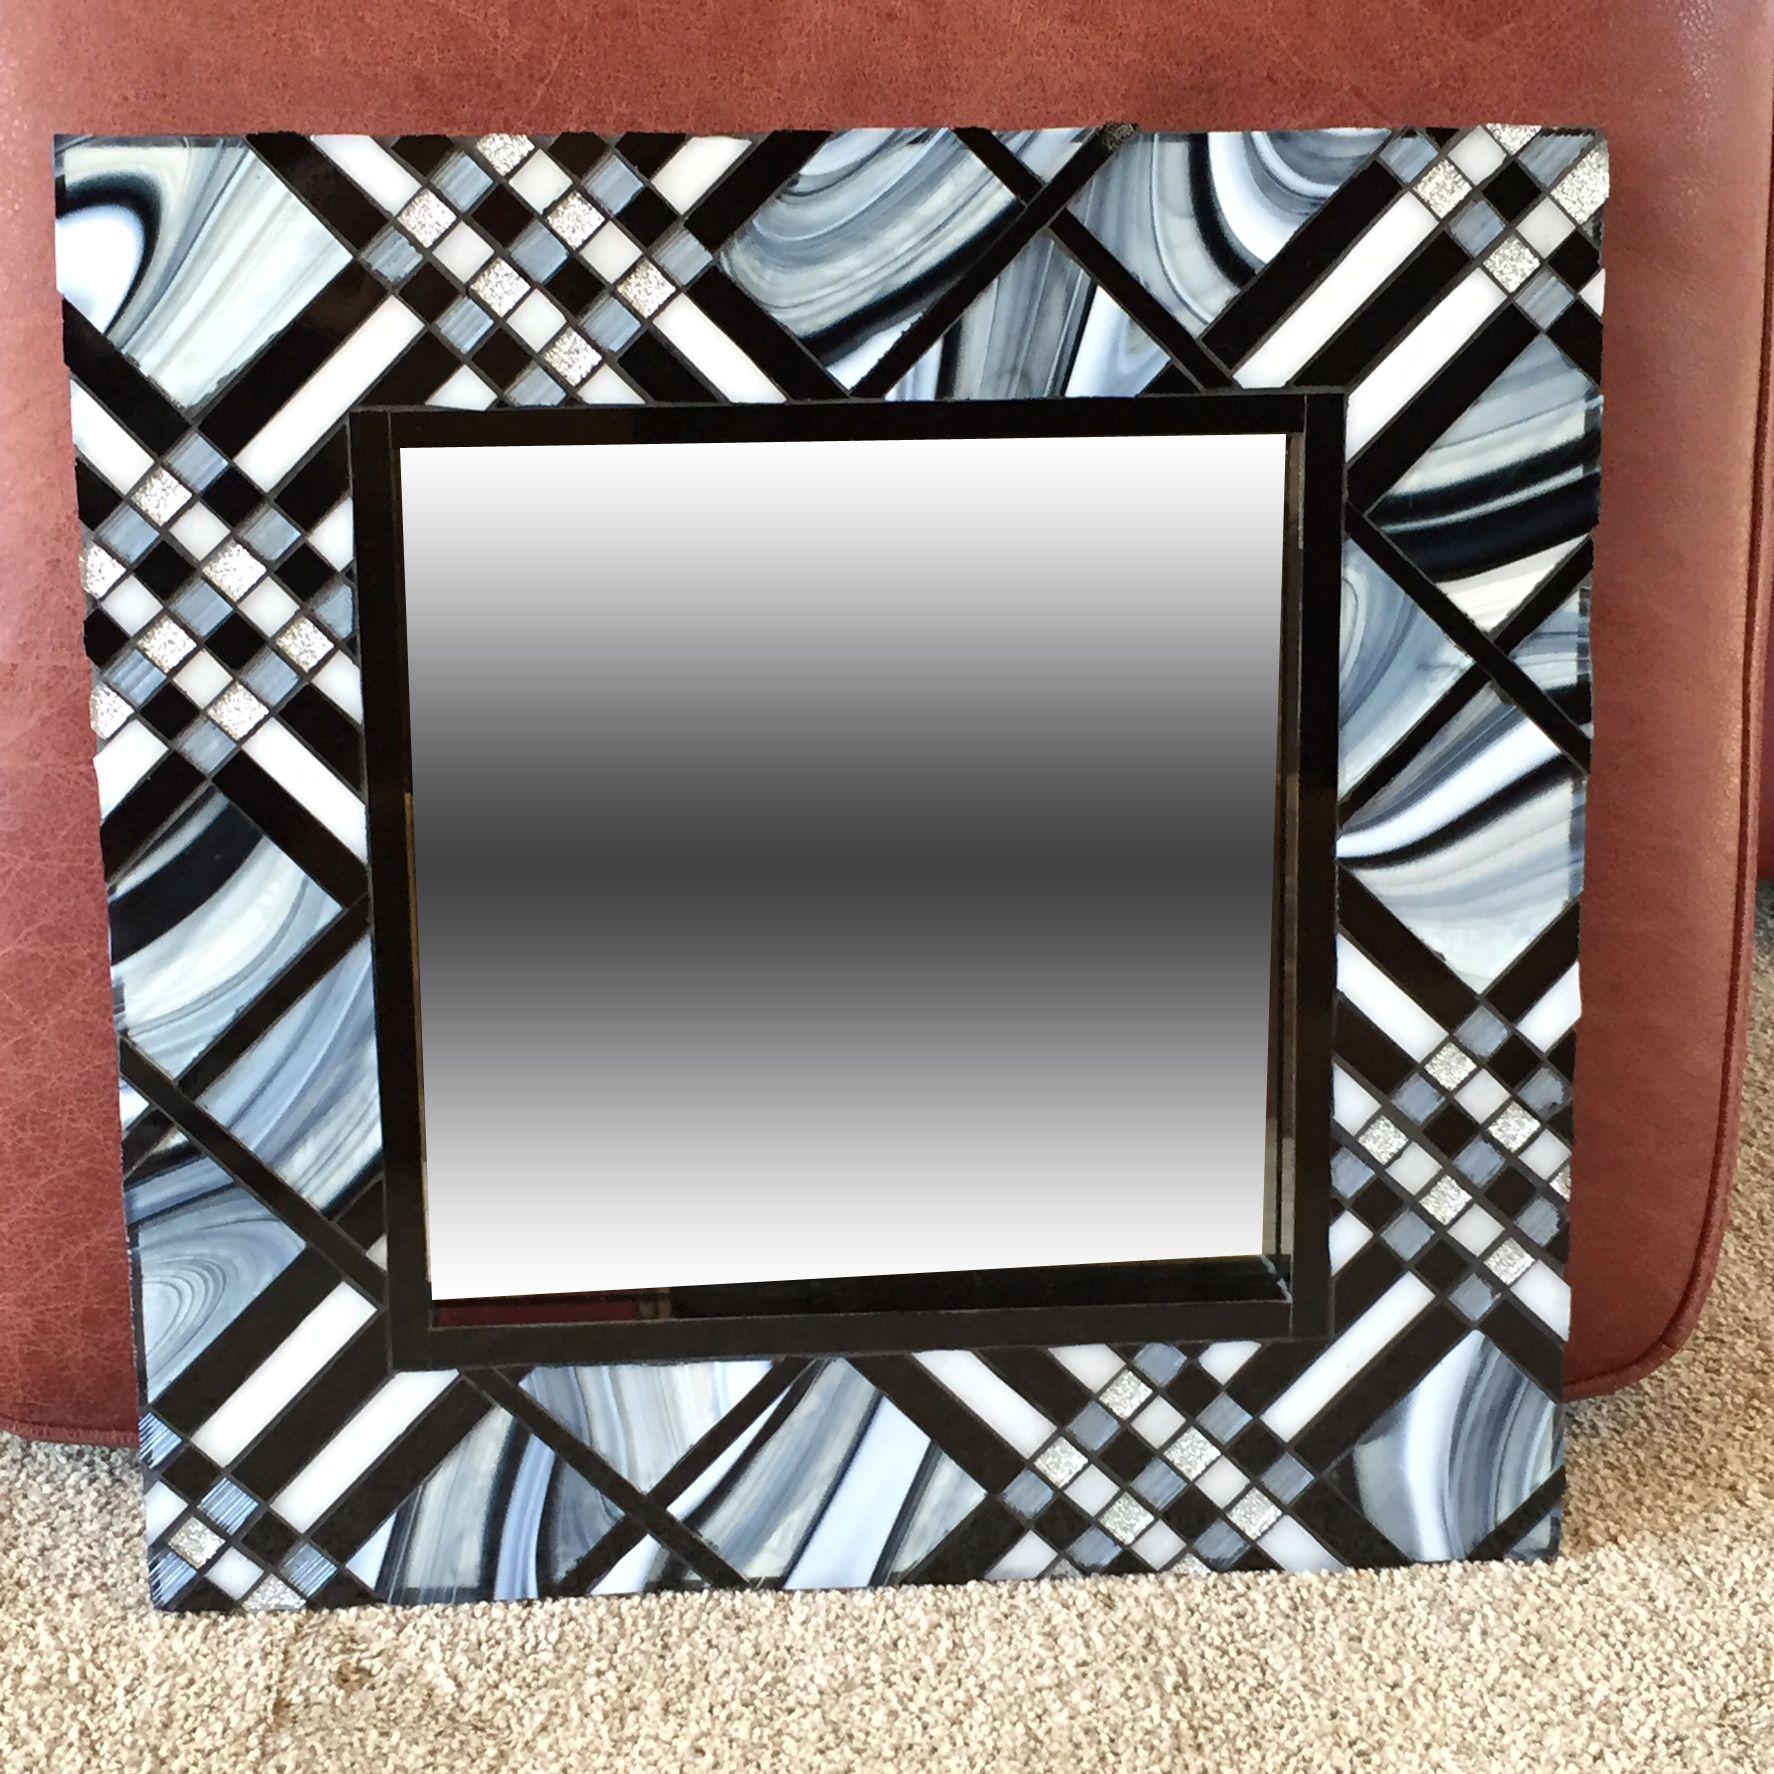 "Burberry plaid mosaic glass mirror, 18"" x 18"""